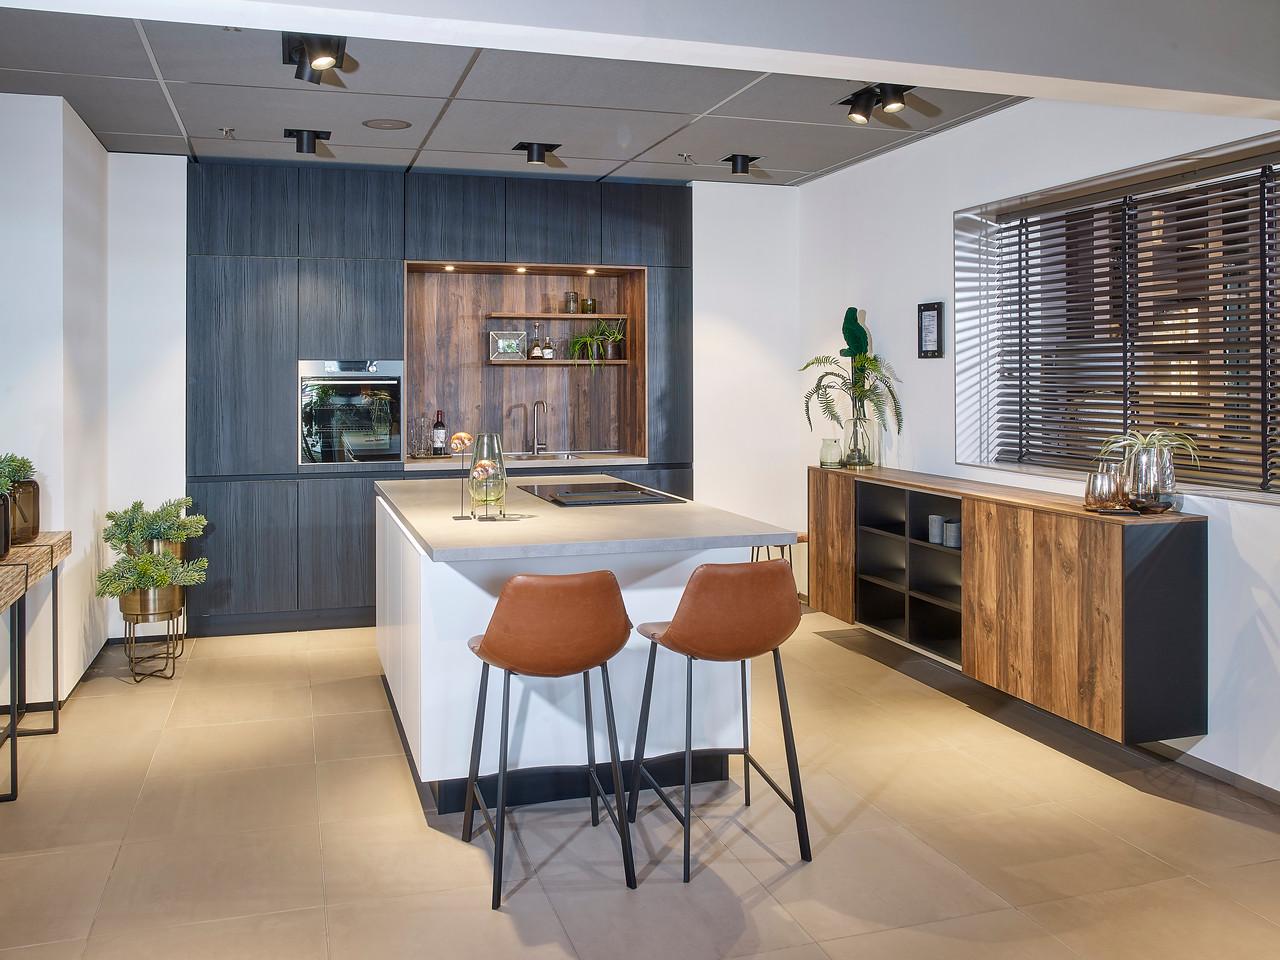 Keuken met dressoir | Tieleman Keukens